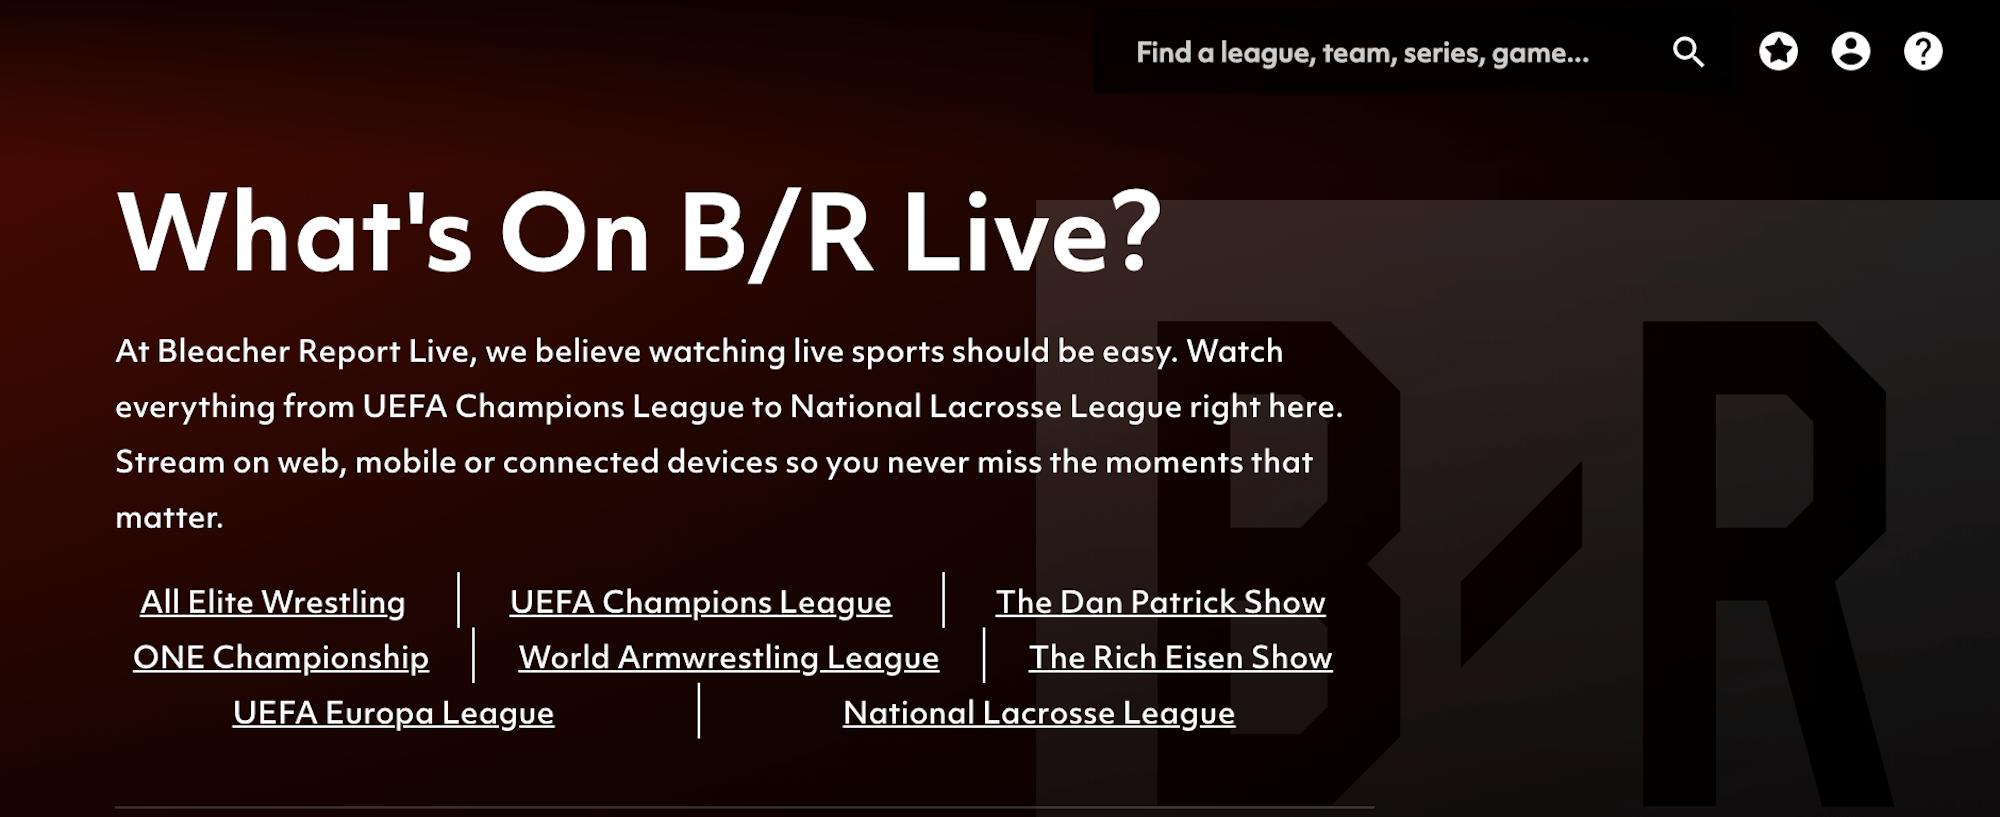 2019-20 uefa champions league tottenham hotspur vs crvena zvezda soccer live stream free b/r live